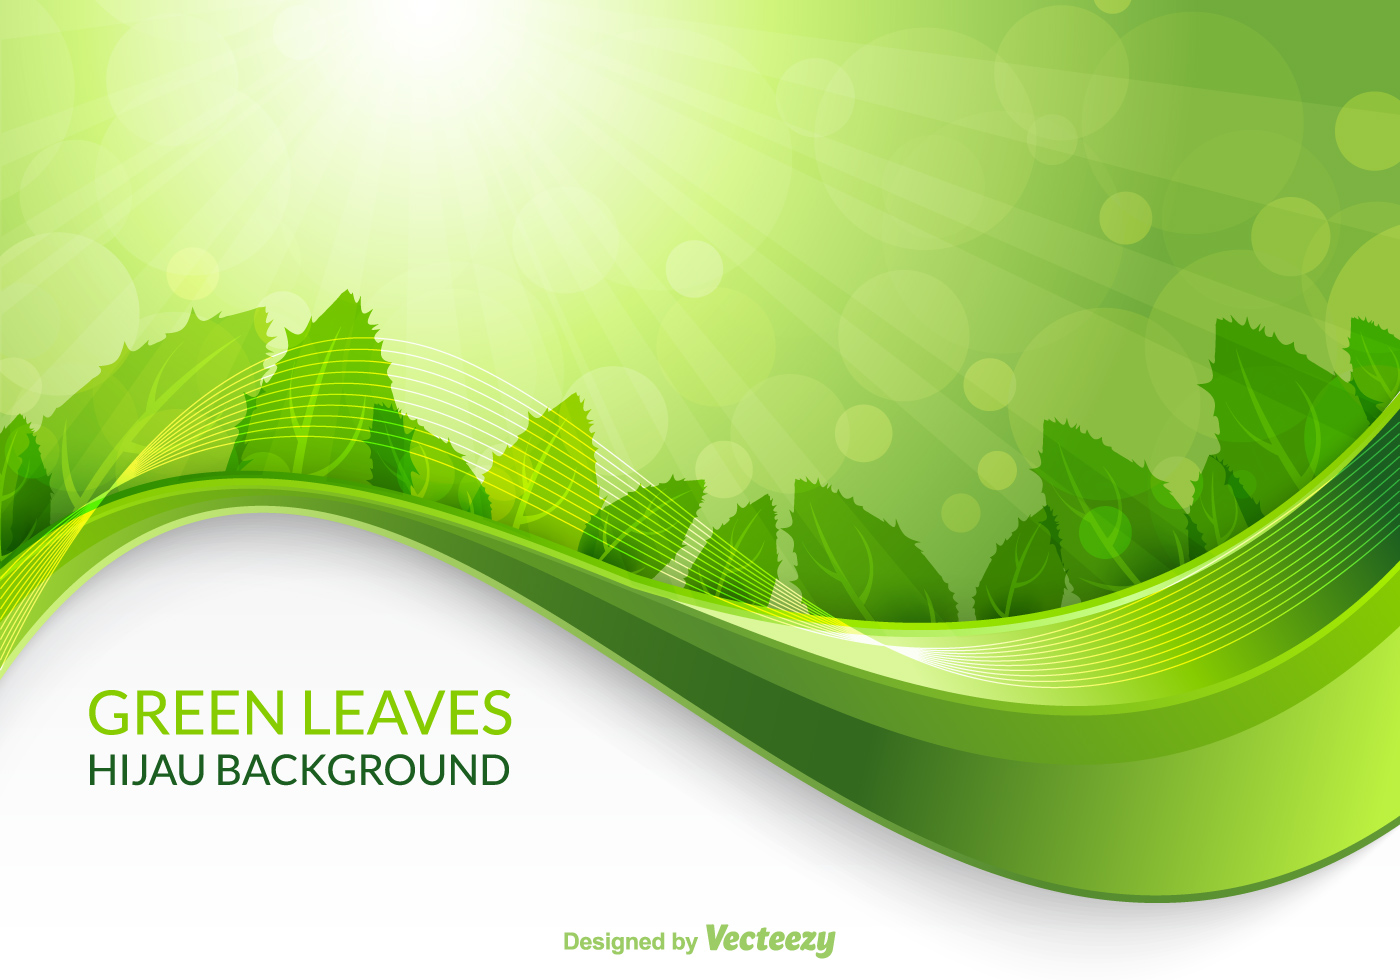 background hijau 1400x980 wallpaper teahub io background hijau 1400x980 wallpaper